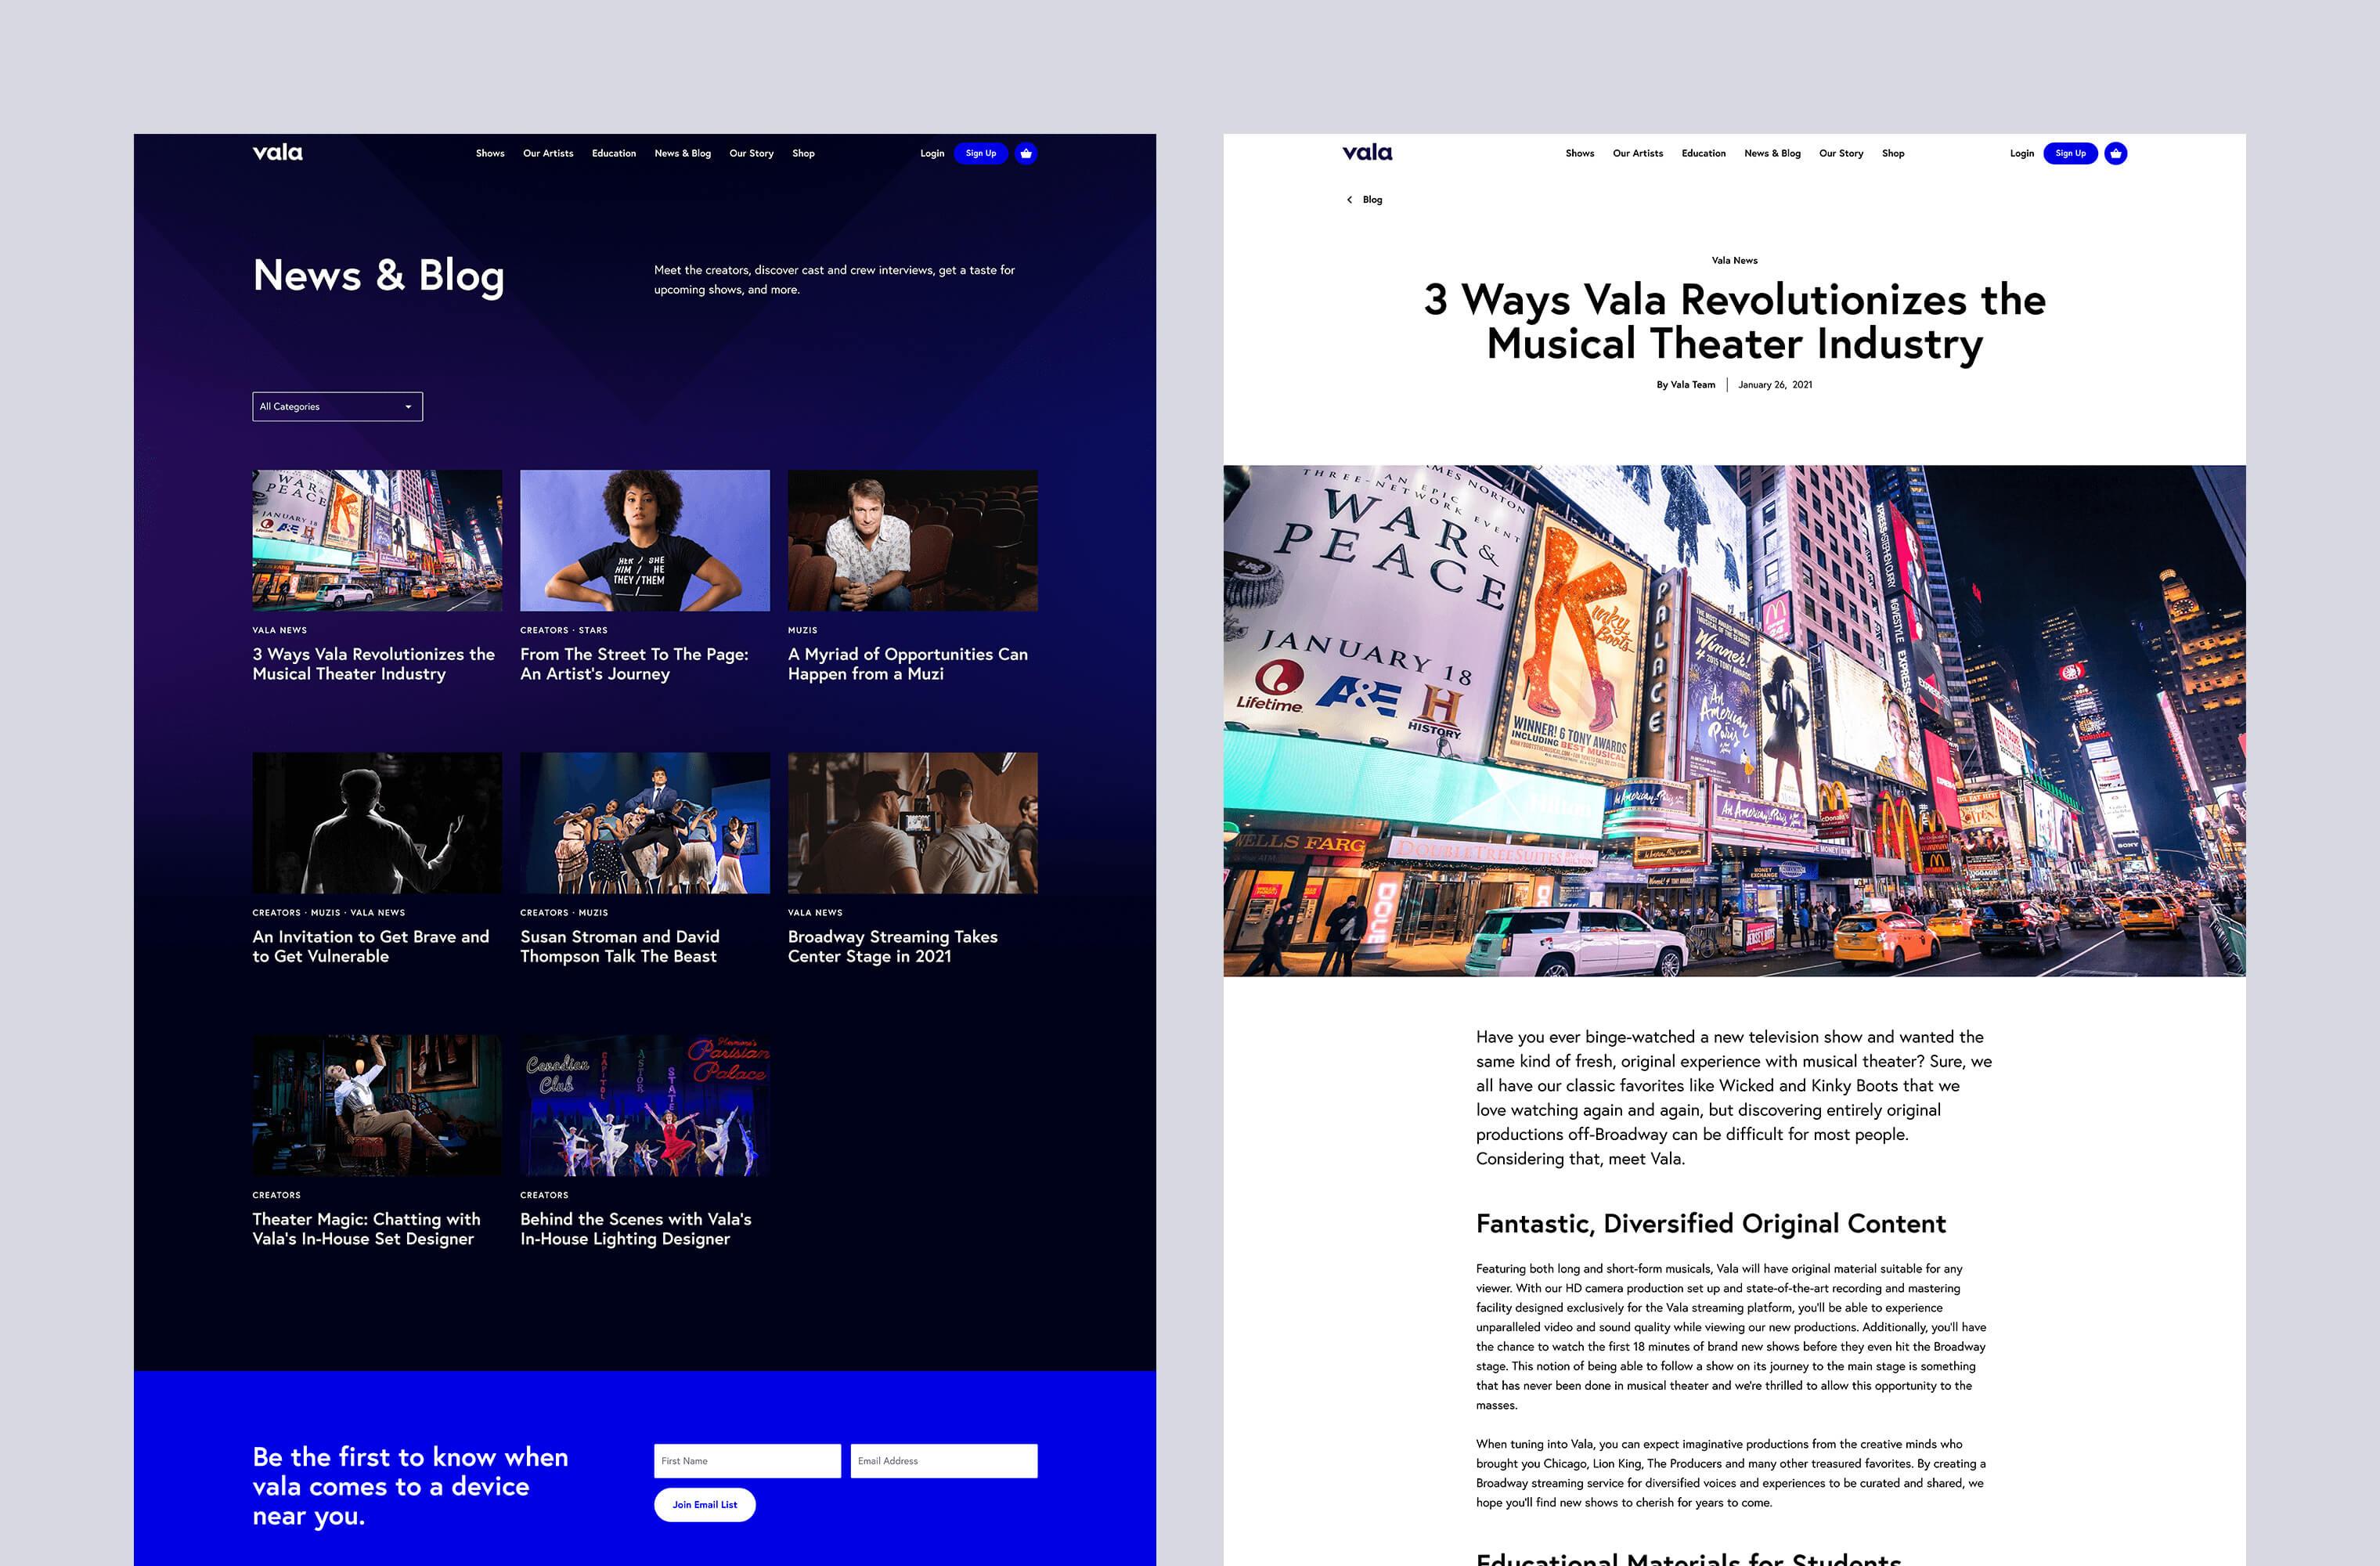 Desktop 'Blog & News' page for the Grazy website